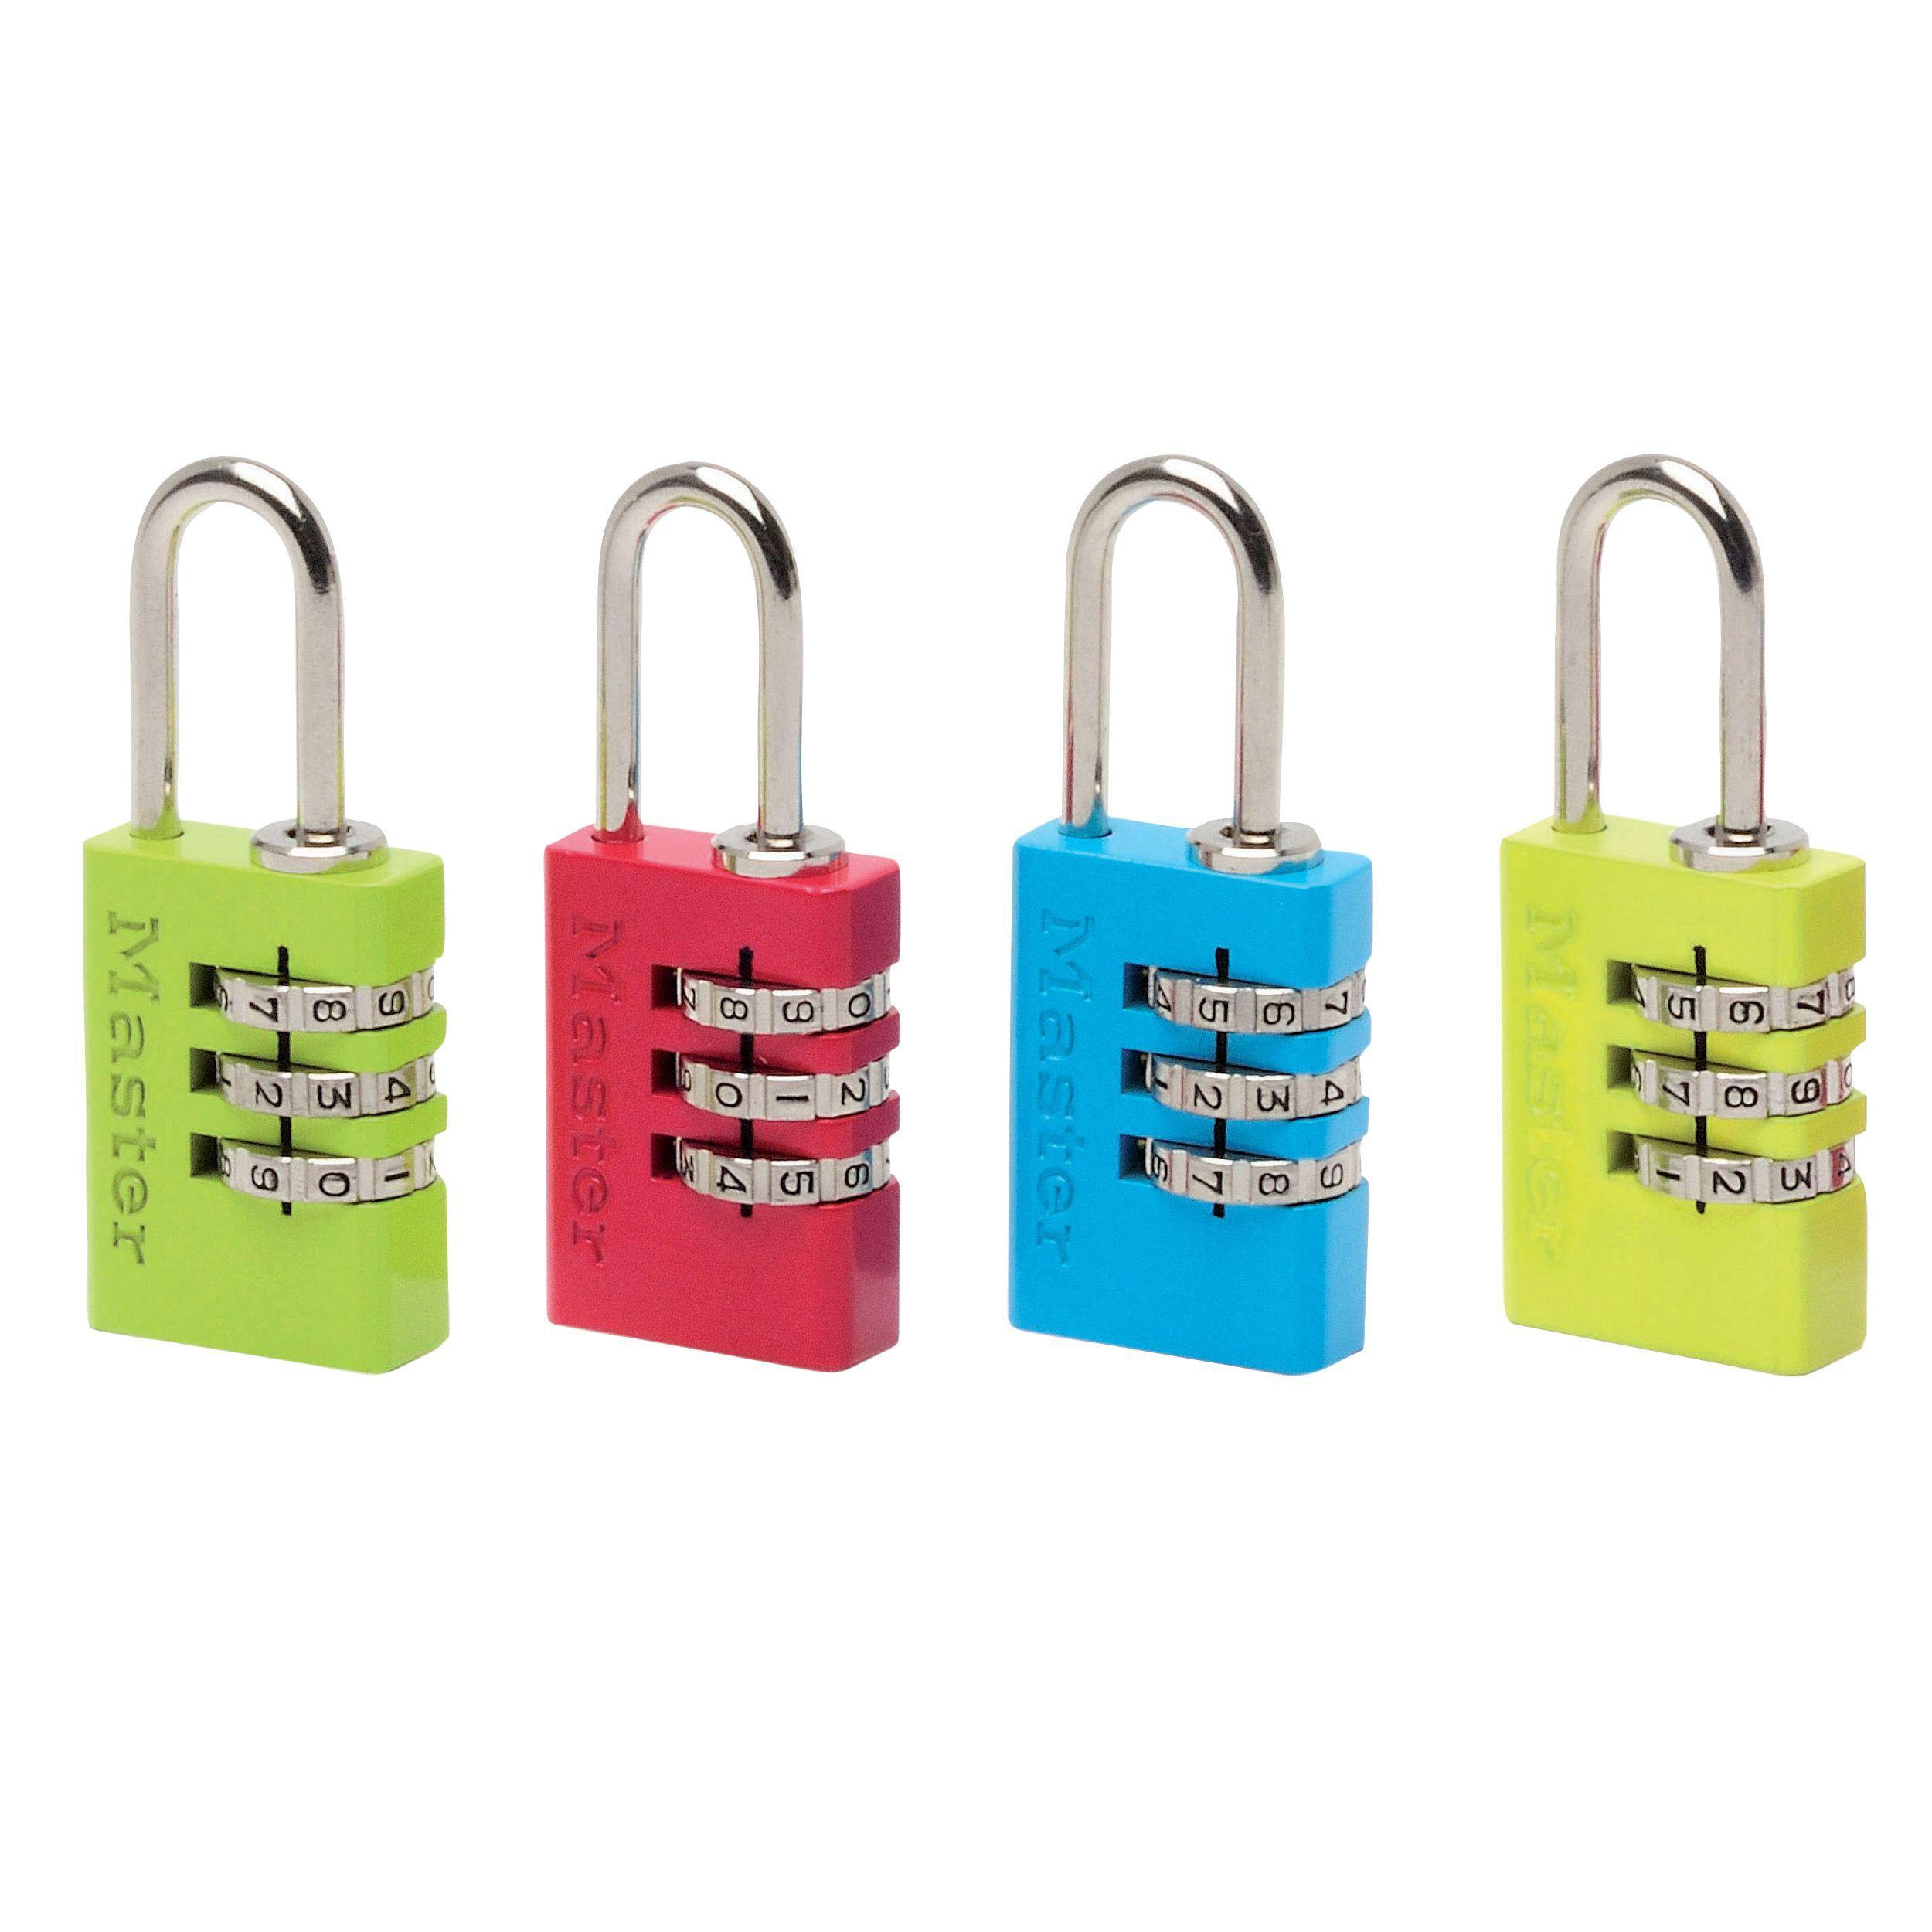 Master Lock Luggage Aluminium Resettable Combination Steel Padlock (w)20mm